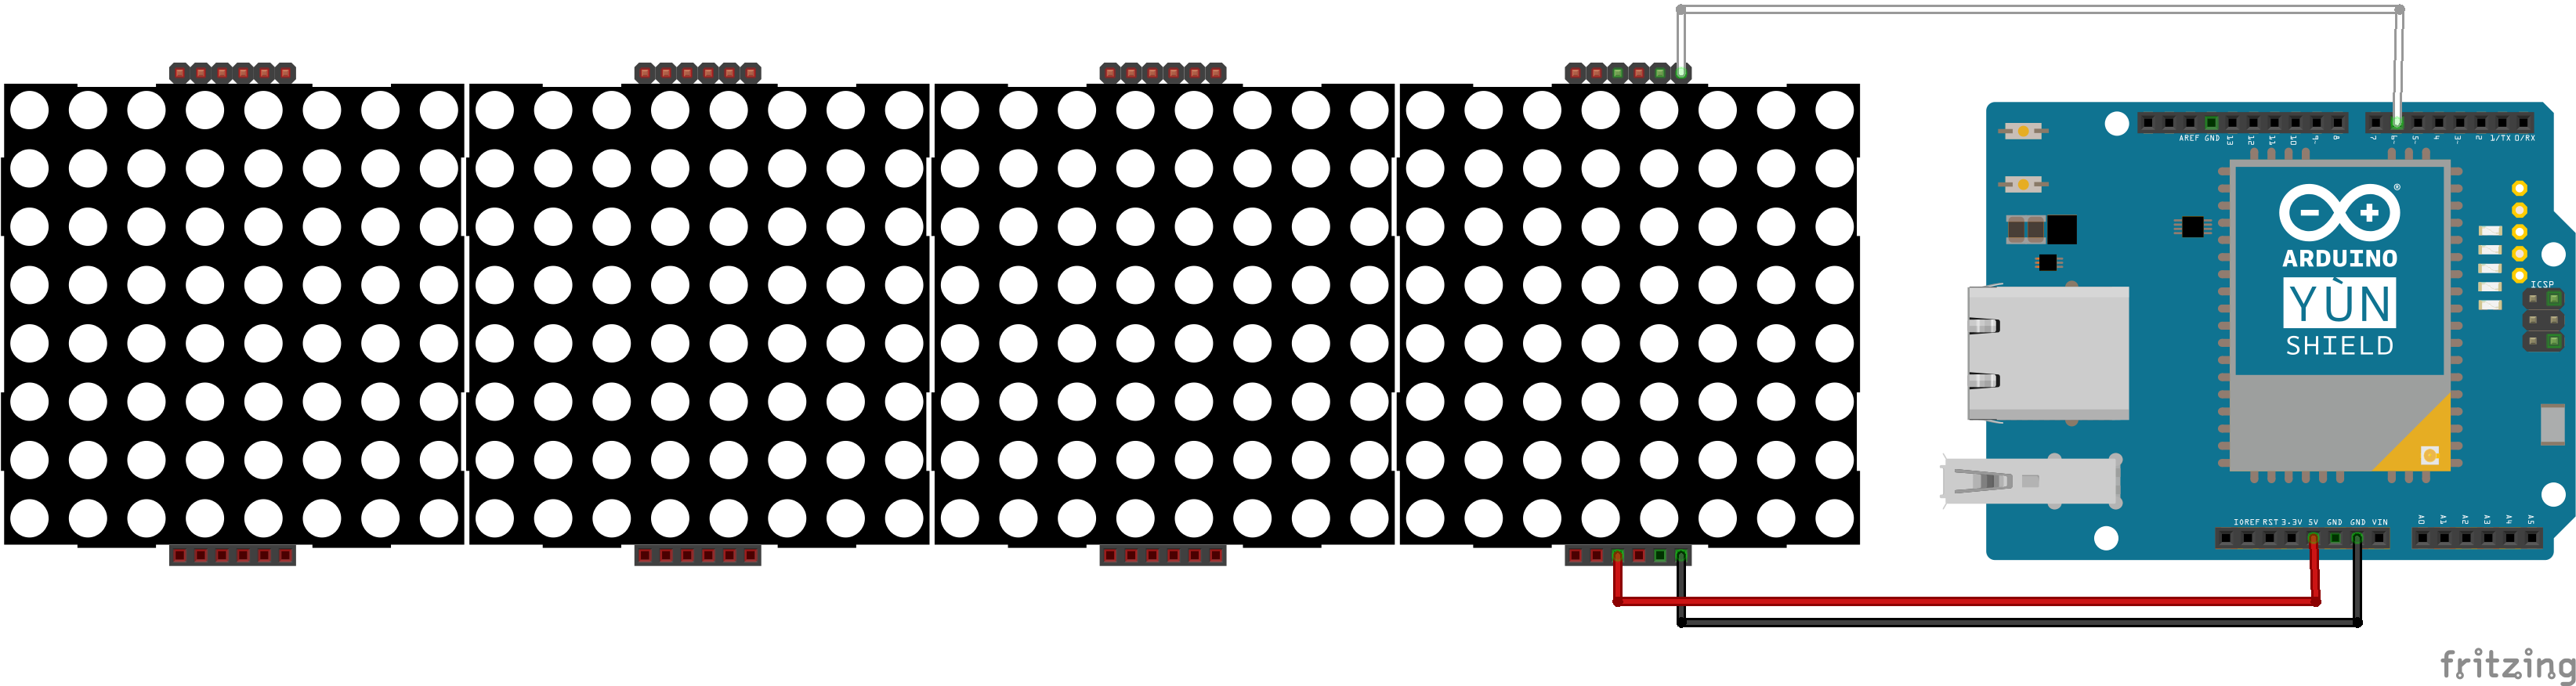 Schematic LedMatrix Tweet Visualization